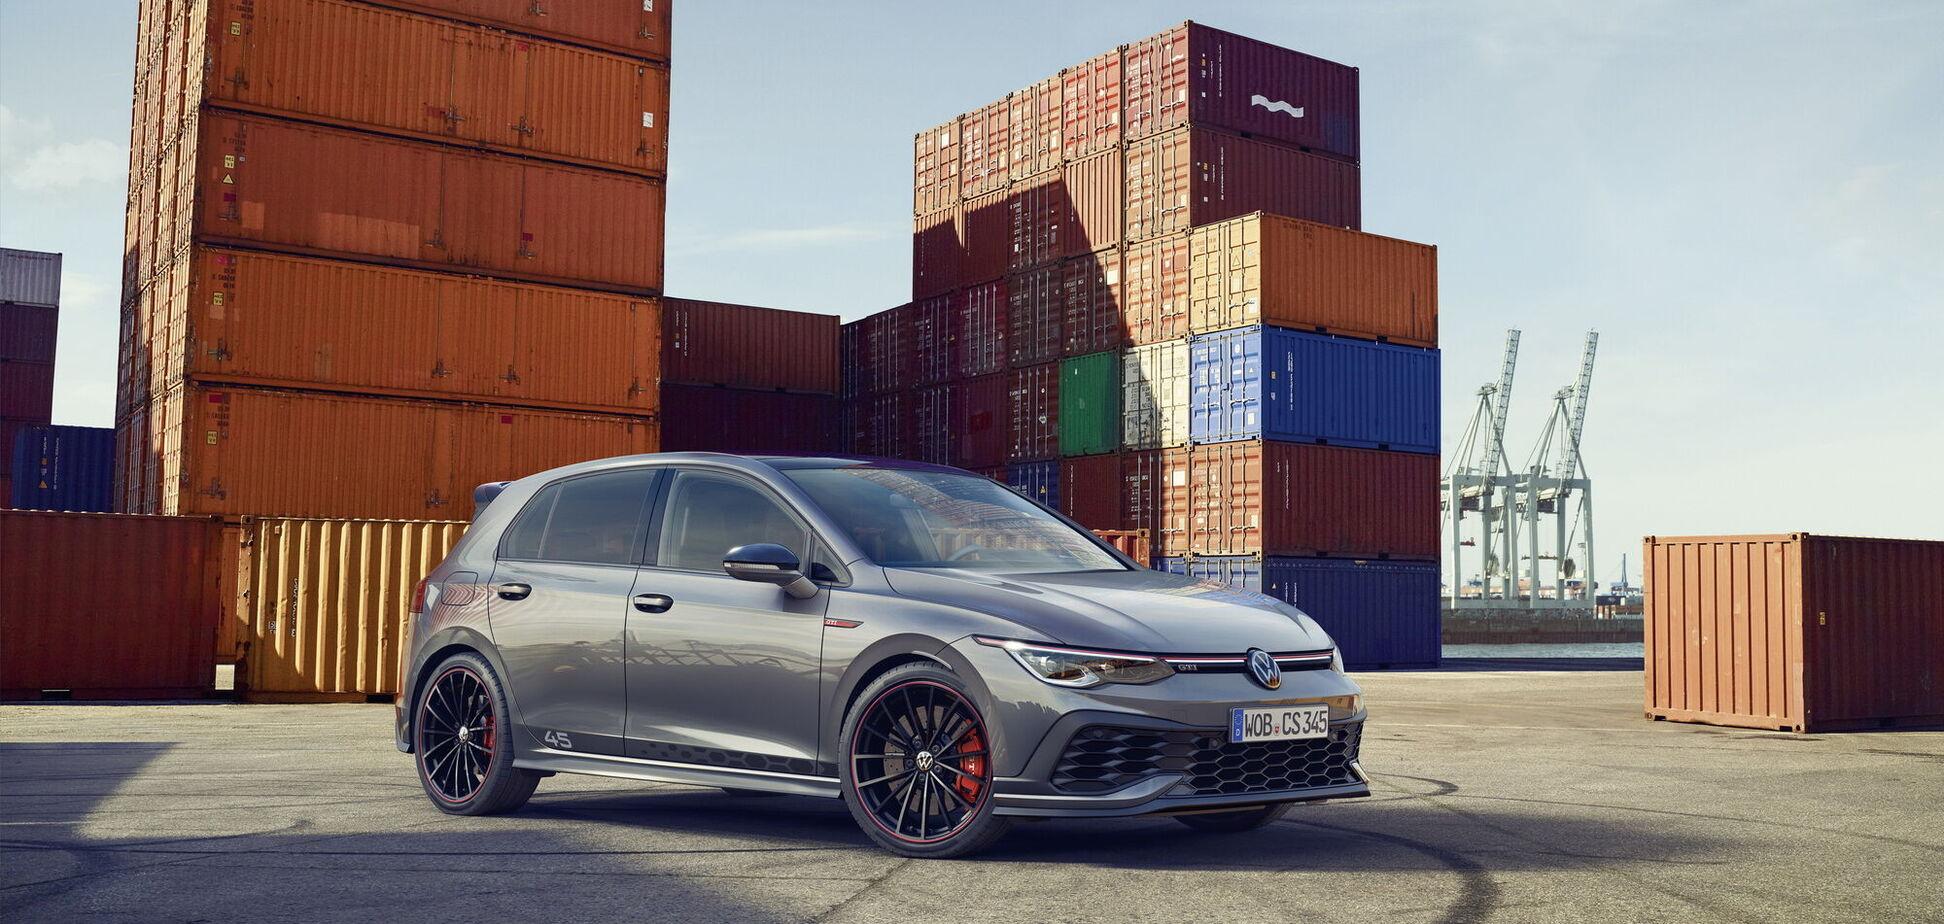 Volkswagen начал продажи юбилейной версии Golf GTI Clubsport 45